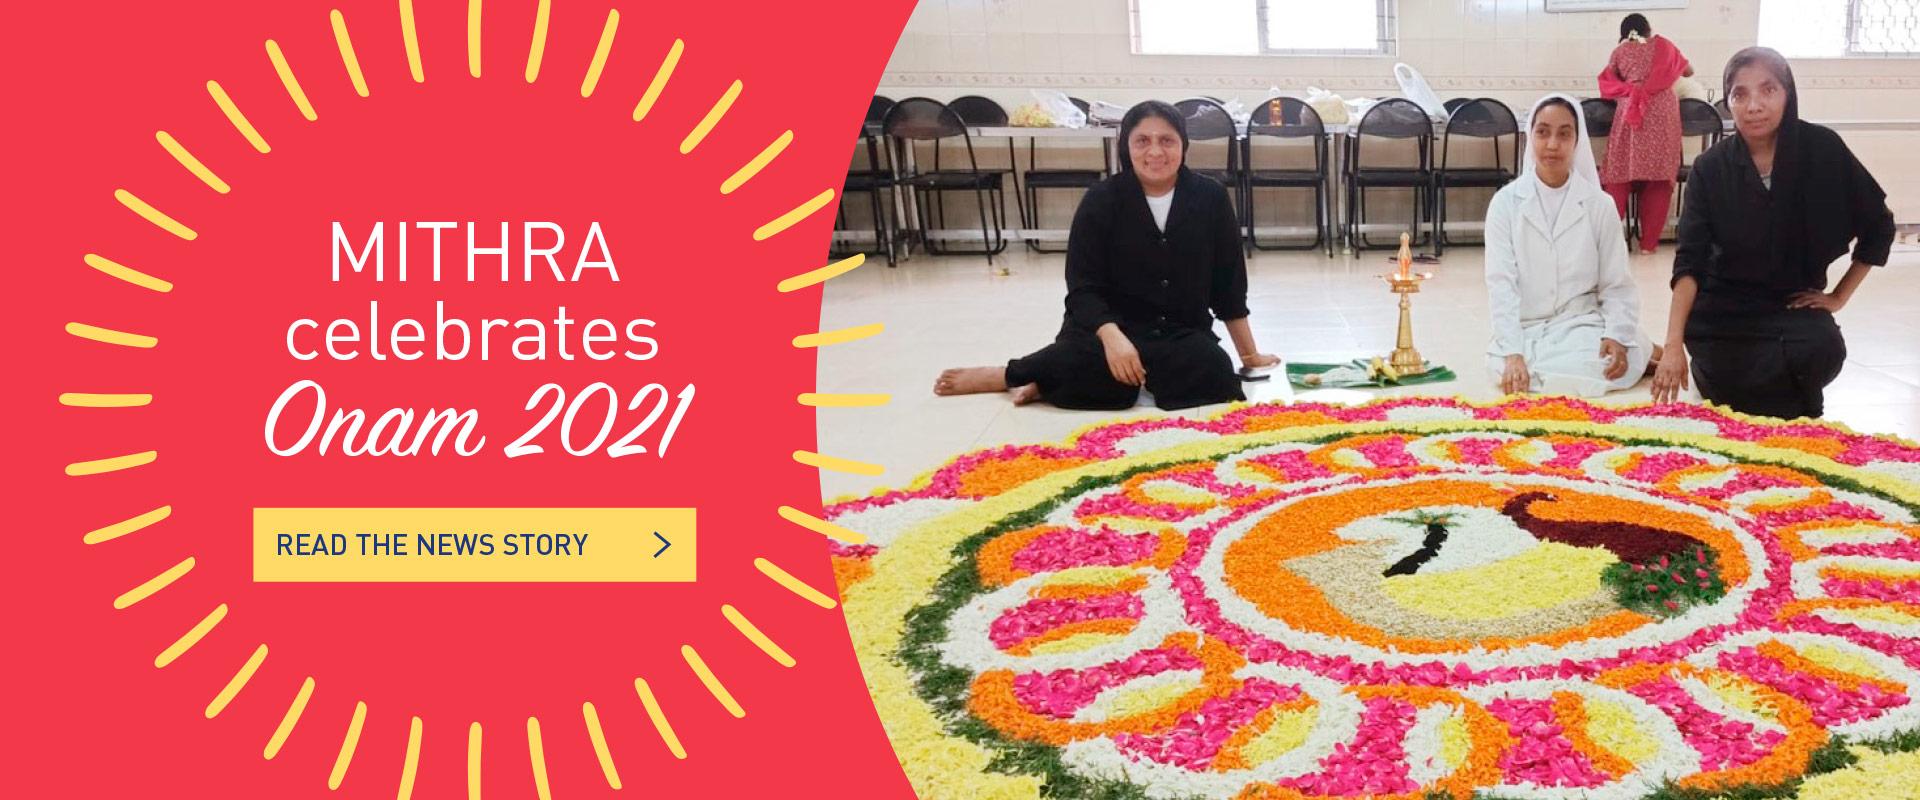 Mithra Celebrates Onam 2021 - Read News story